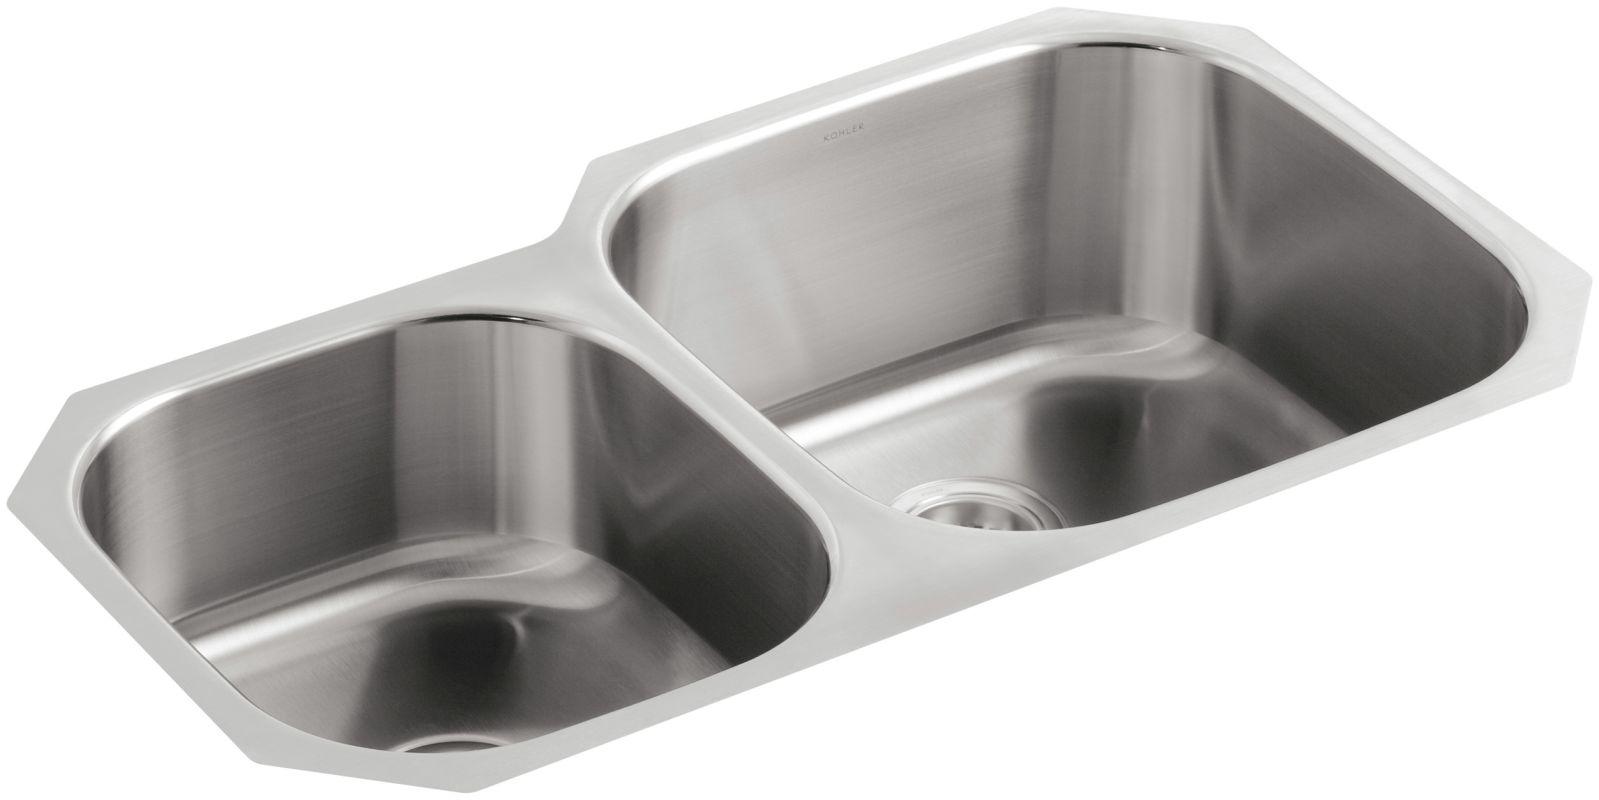 K-3356-L-NA In Stainless Steel By Kohler